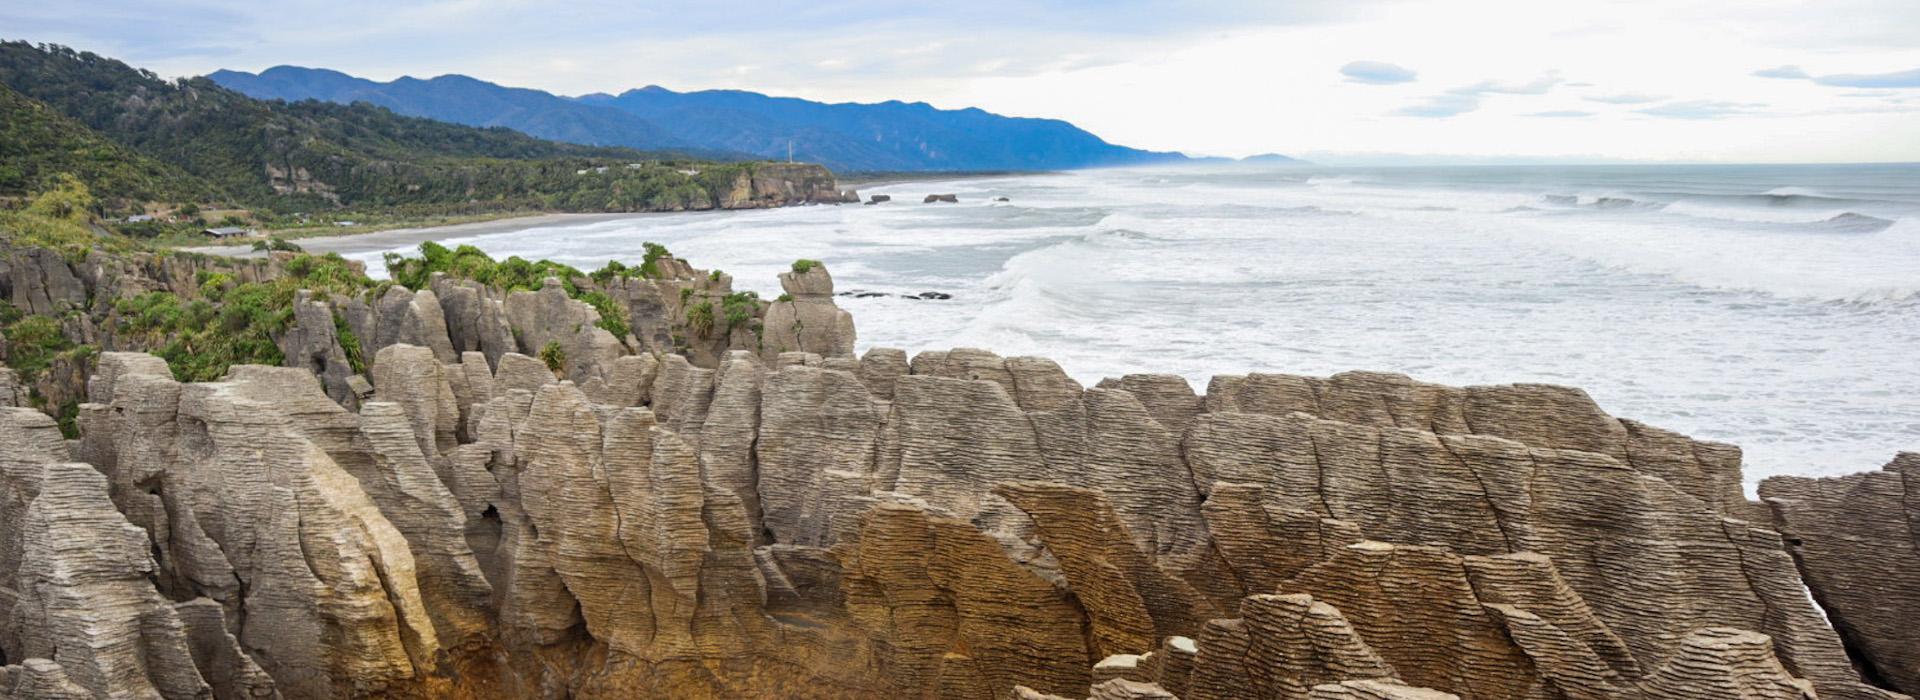 Pancake Rocks, New Zealand @Nothing familiar